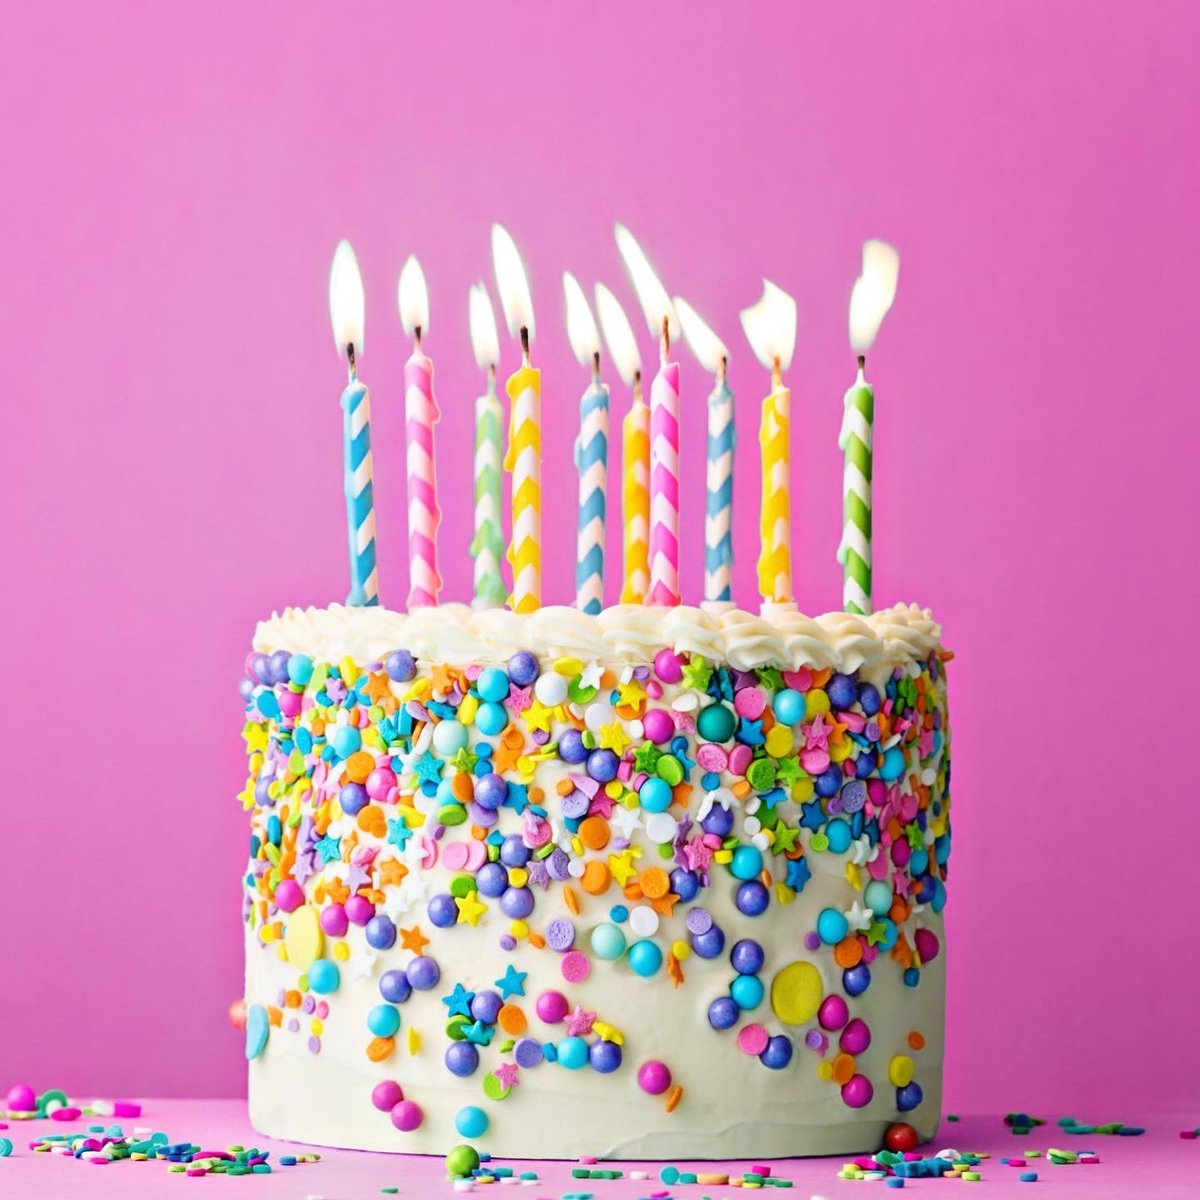 Wondrous The Safe Fair Food Company On Twitter We Put Birthday Cake In Funny Birthday Cards Online Unhofree Goldxyz